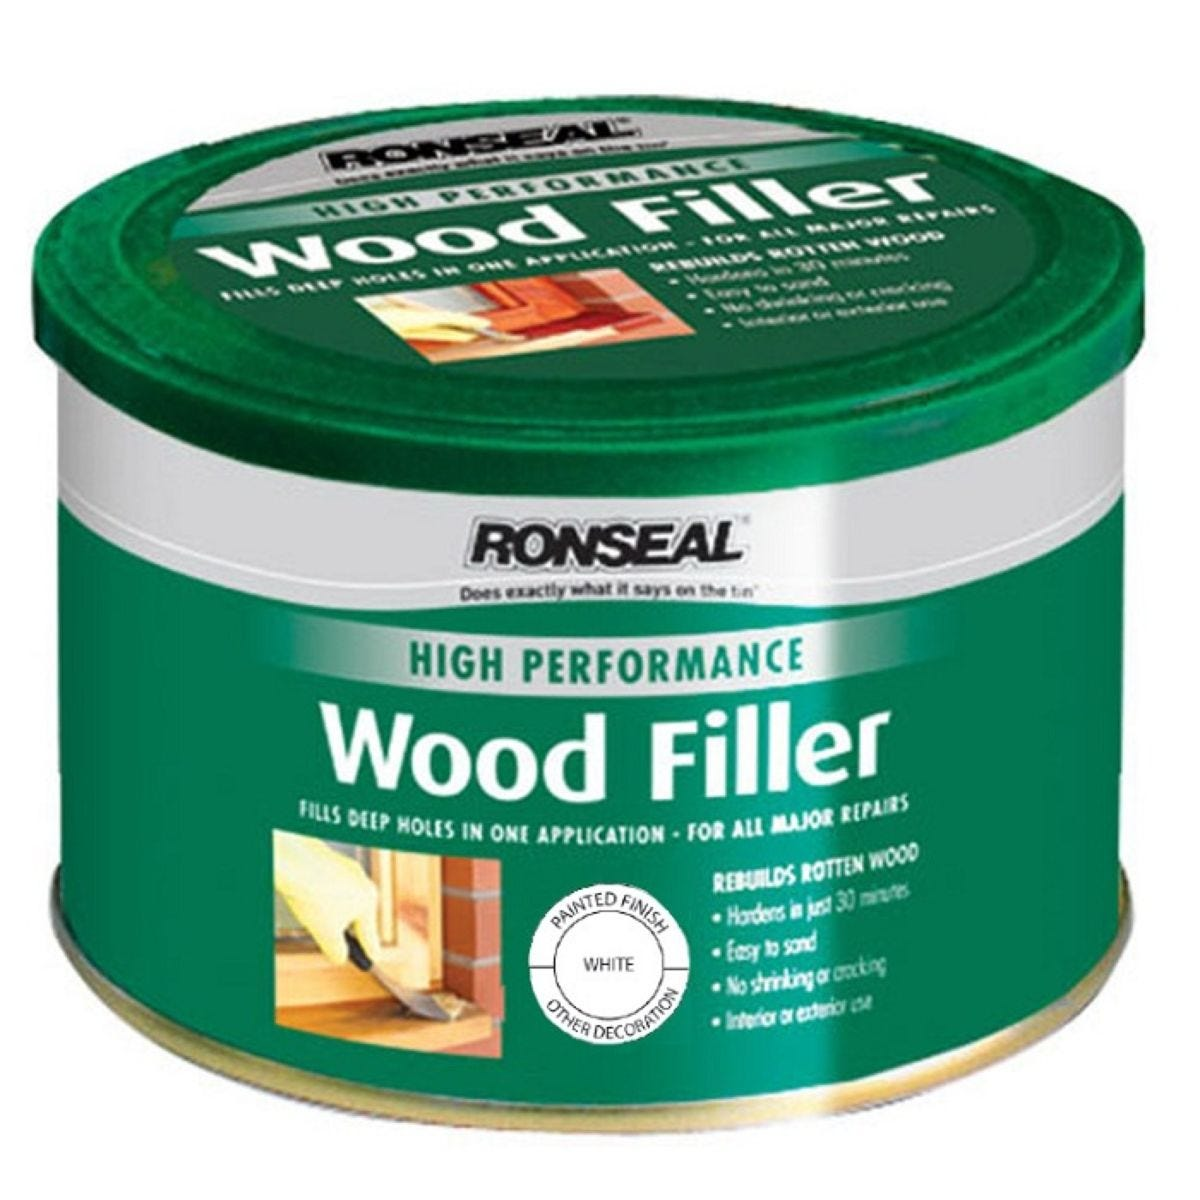 Ronseal High Performance Wood filler White 275